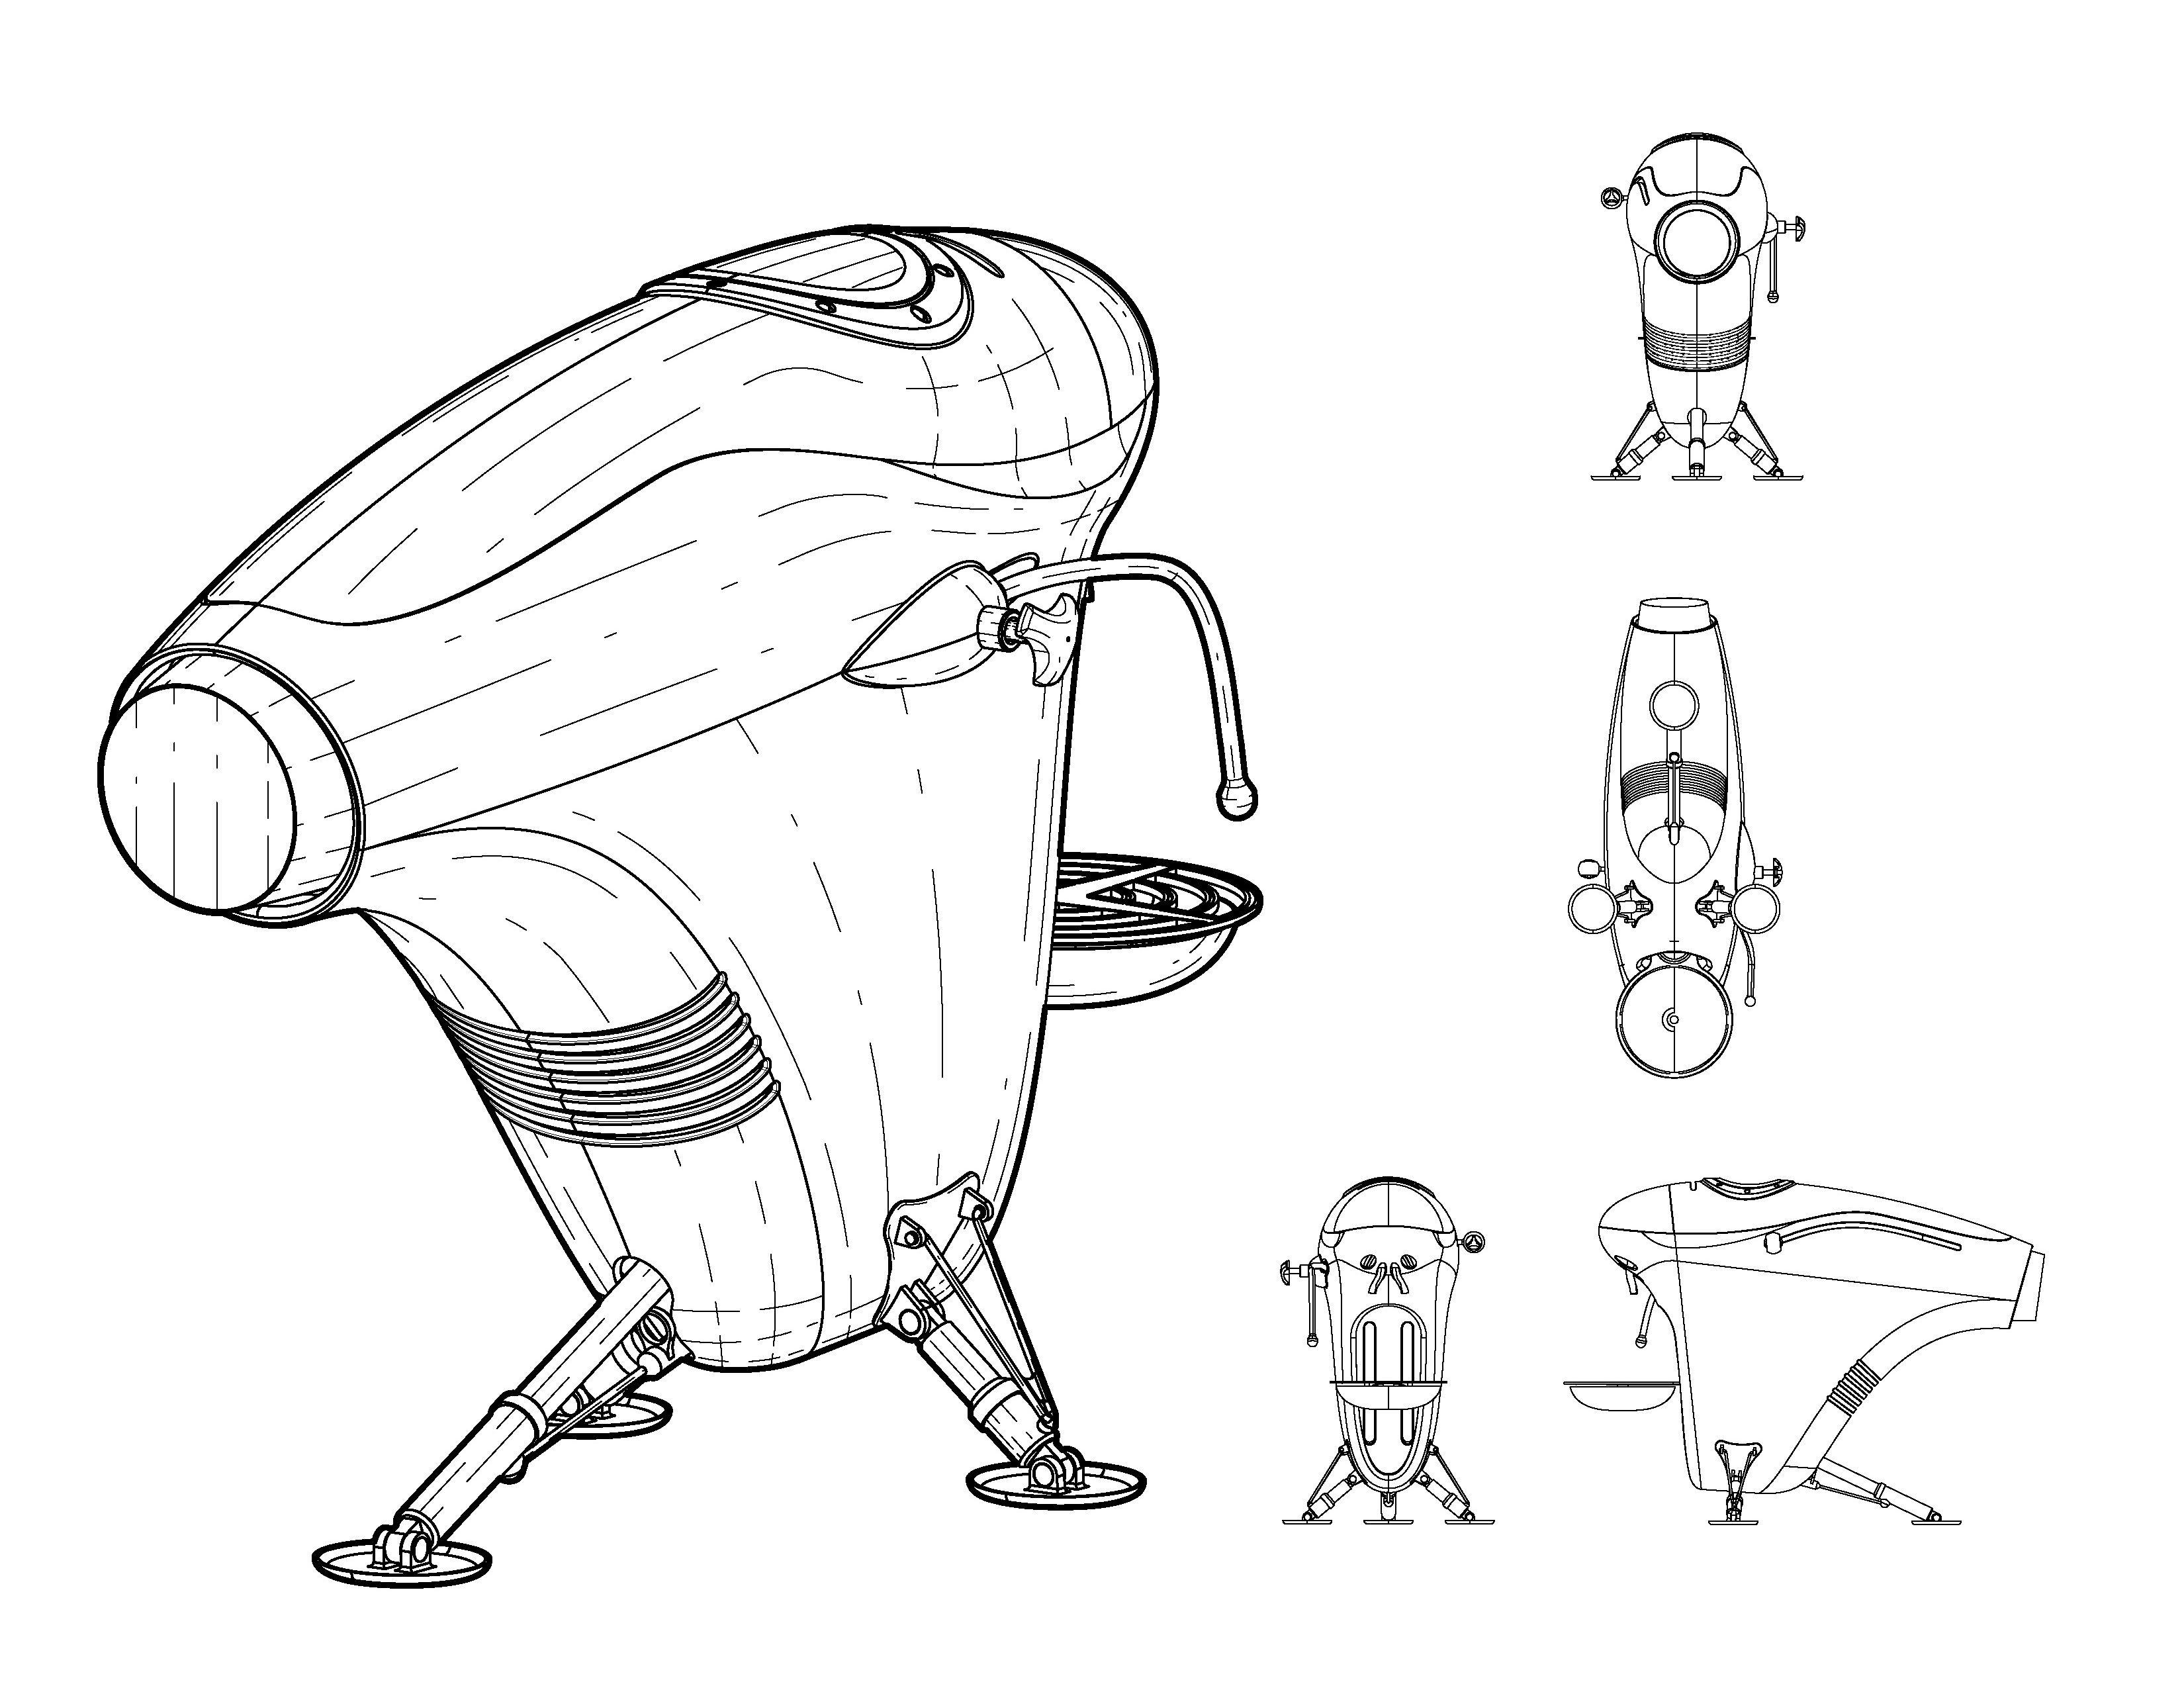 3300x2550 Ascadex Patent Drawings